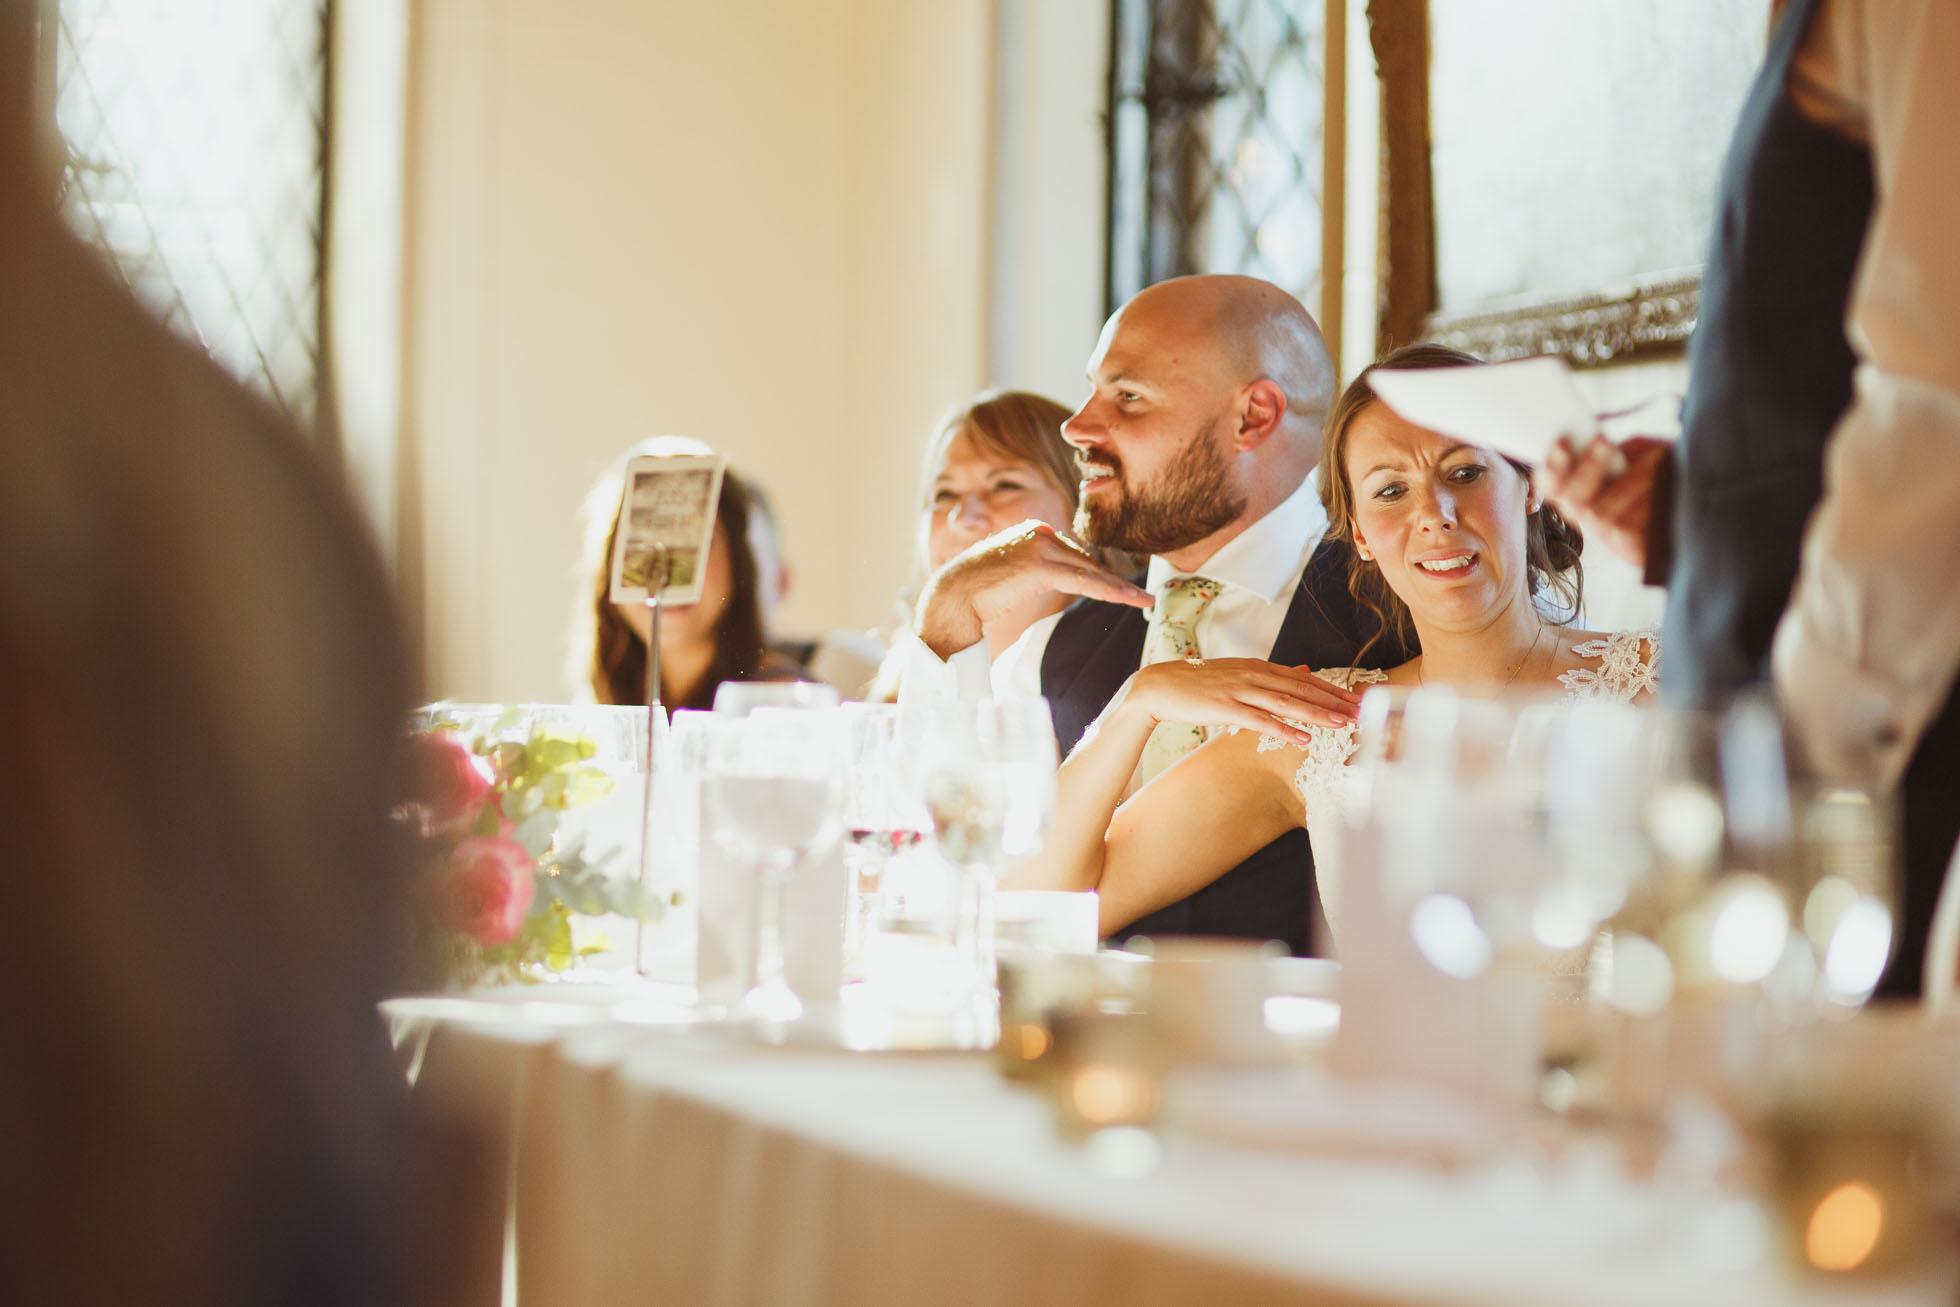 denton-hall-wedding-photographer-52.jpg